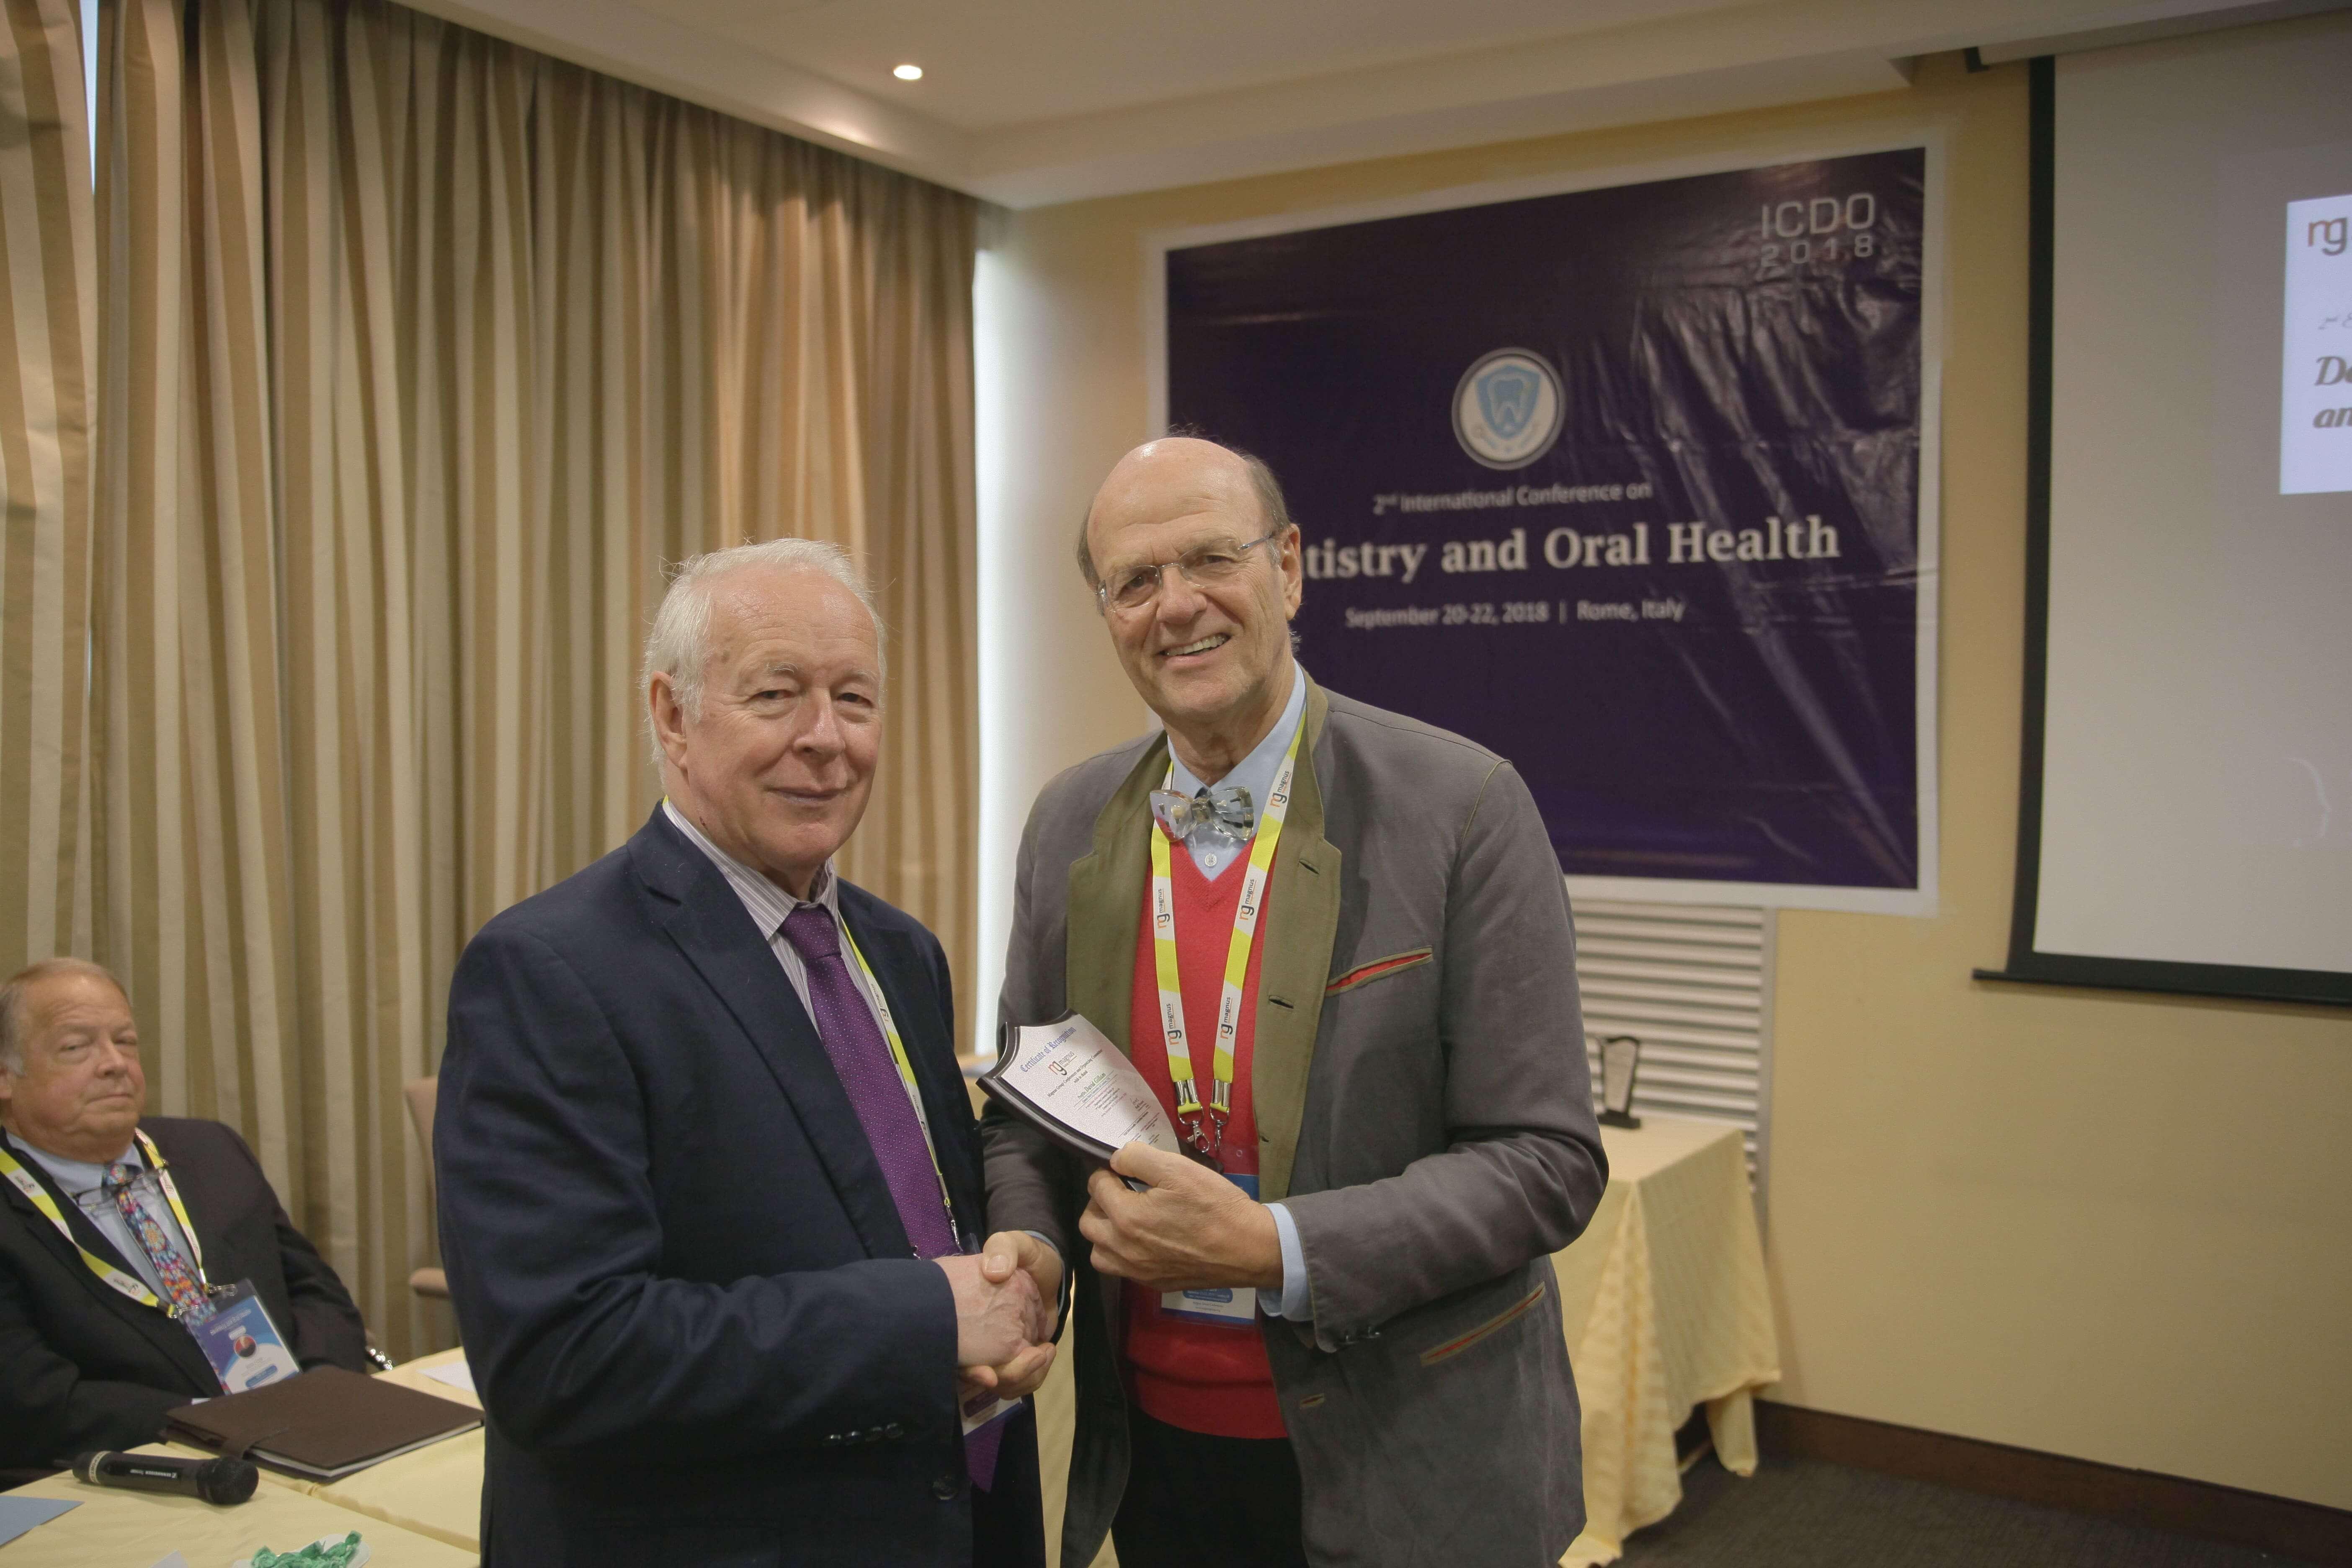 Dental education conferences